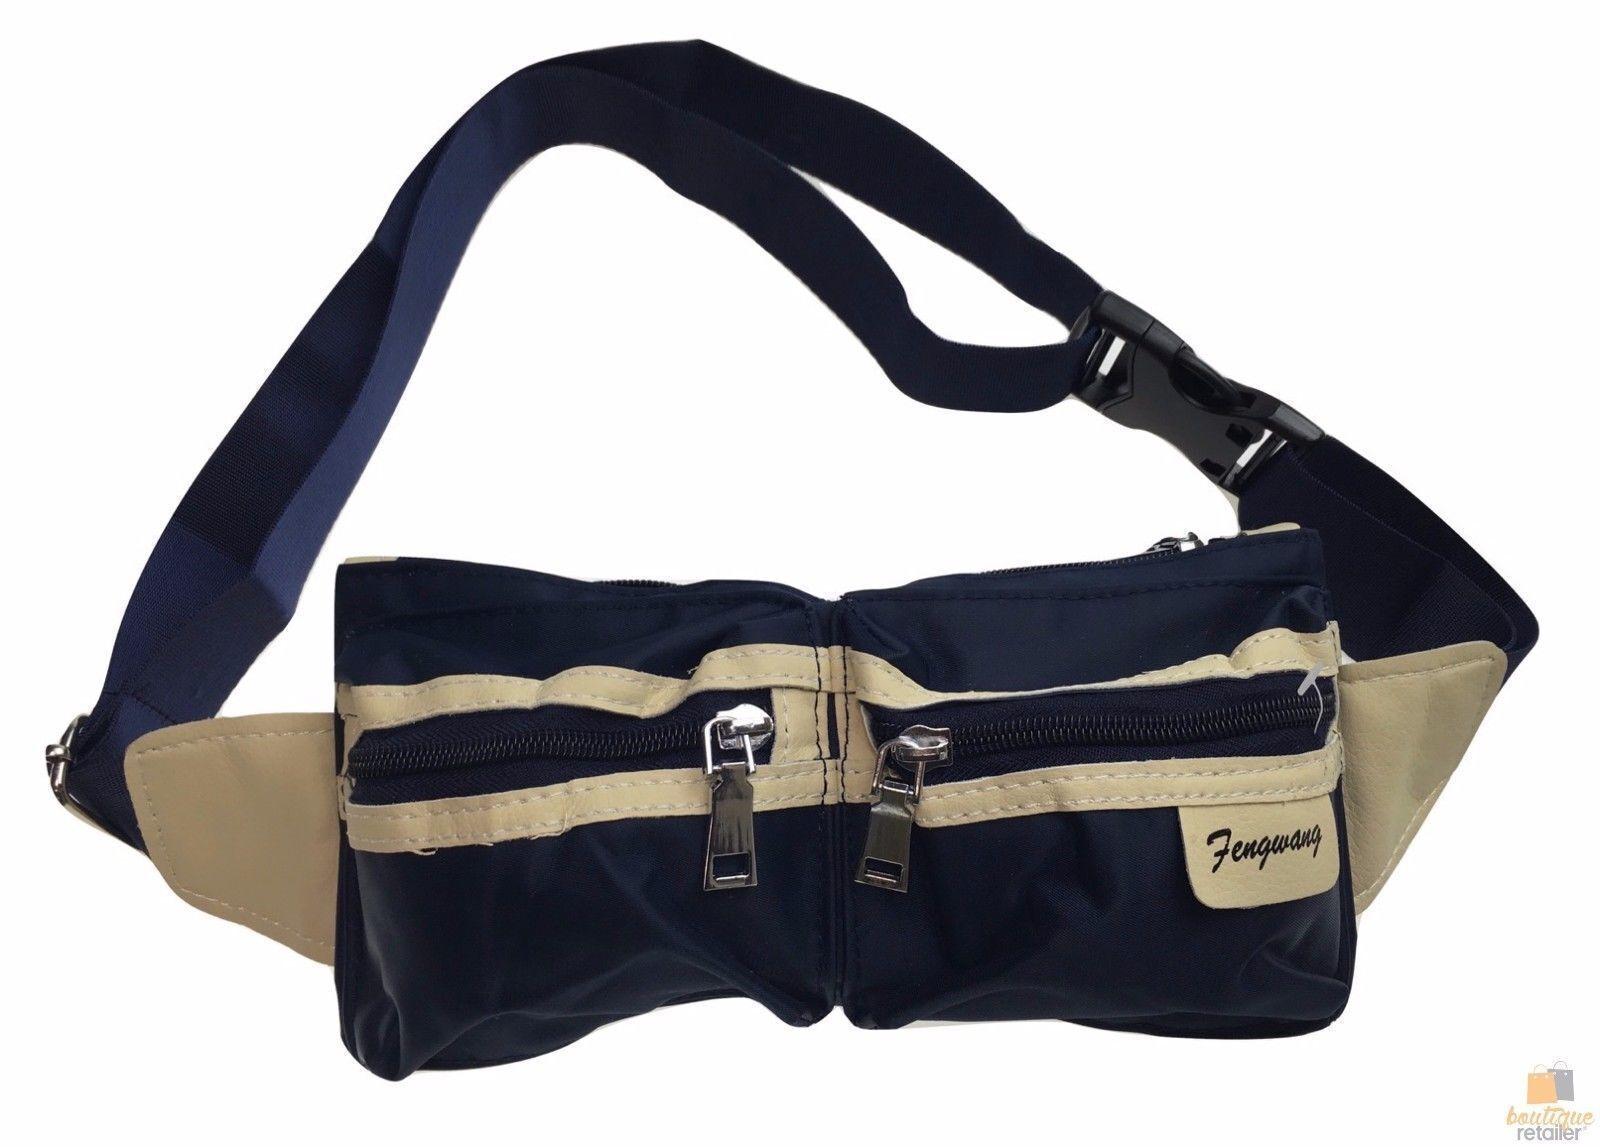 BUM BAG Waist Belt Pouch Travel Hiking Zip Pockets Money Wallet Leather Trim